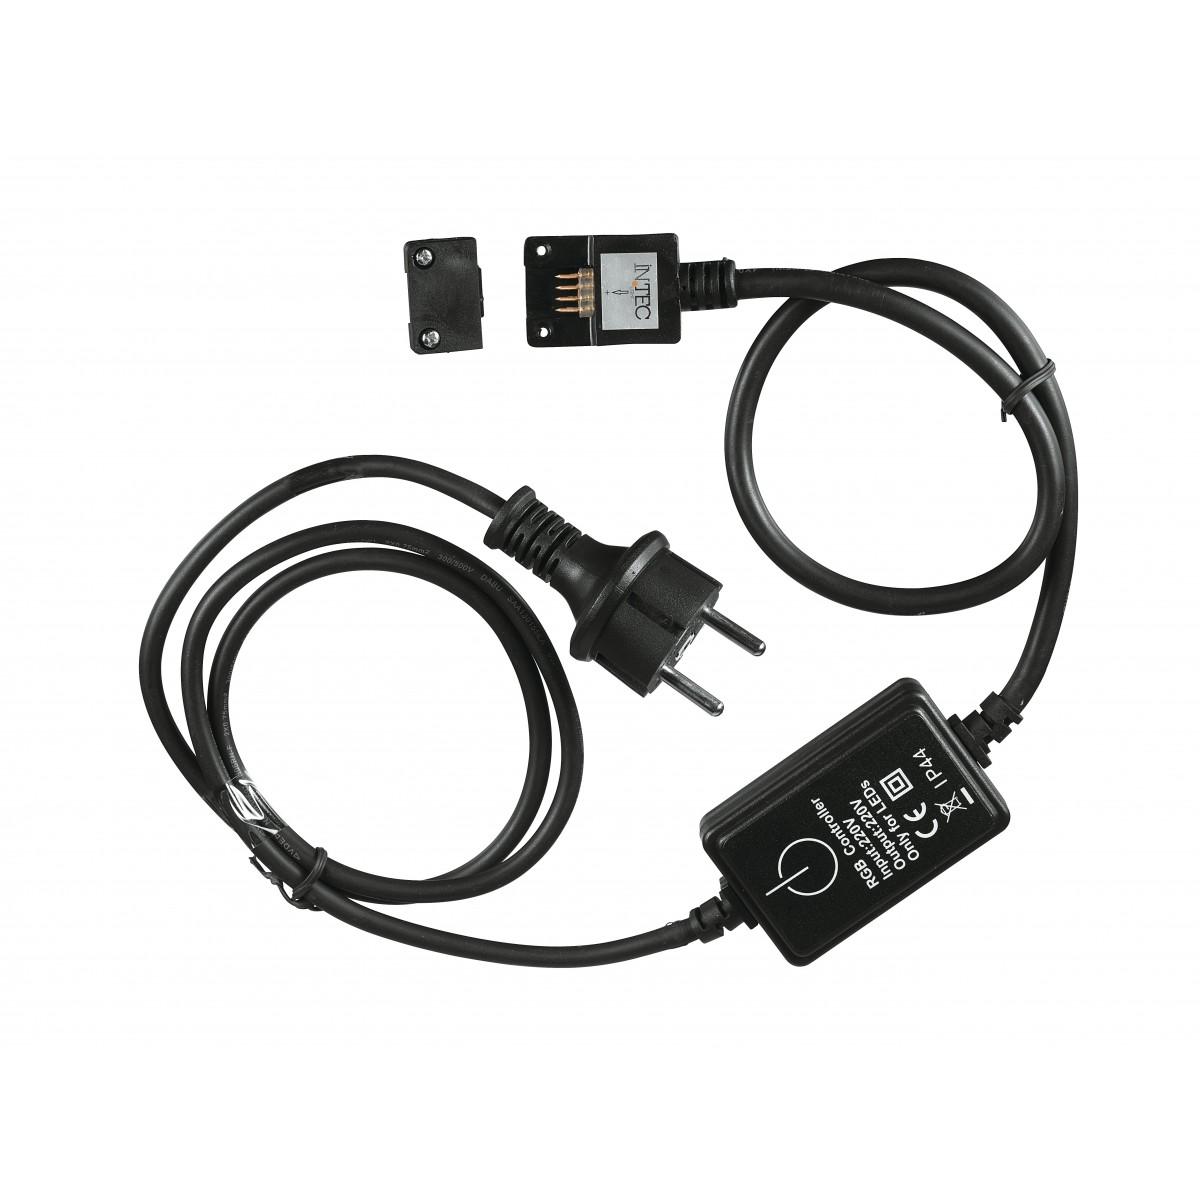 STRIP-ADAPT-HV-RGB - Adaptateur avec